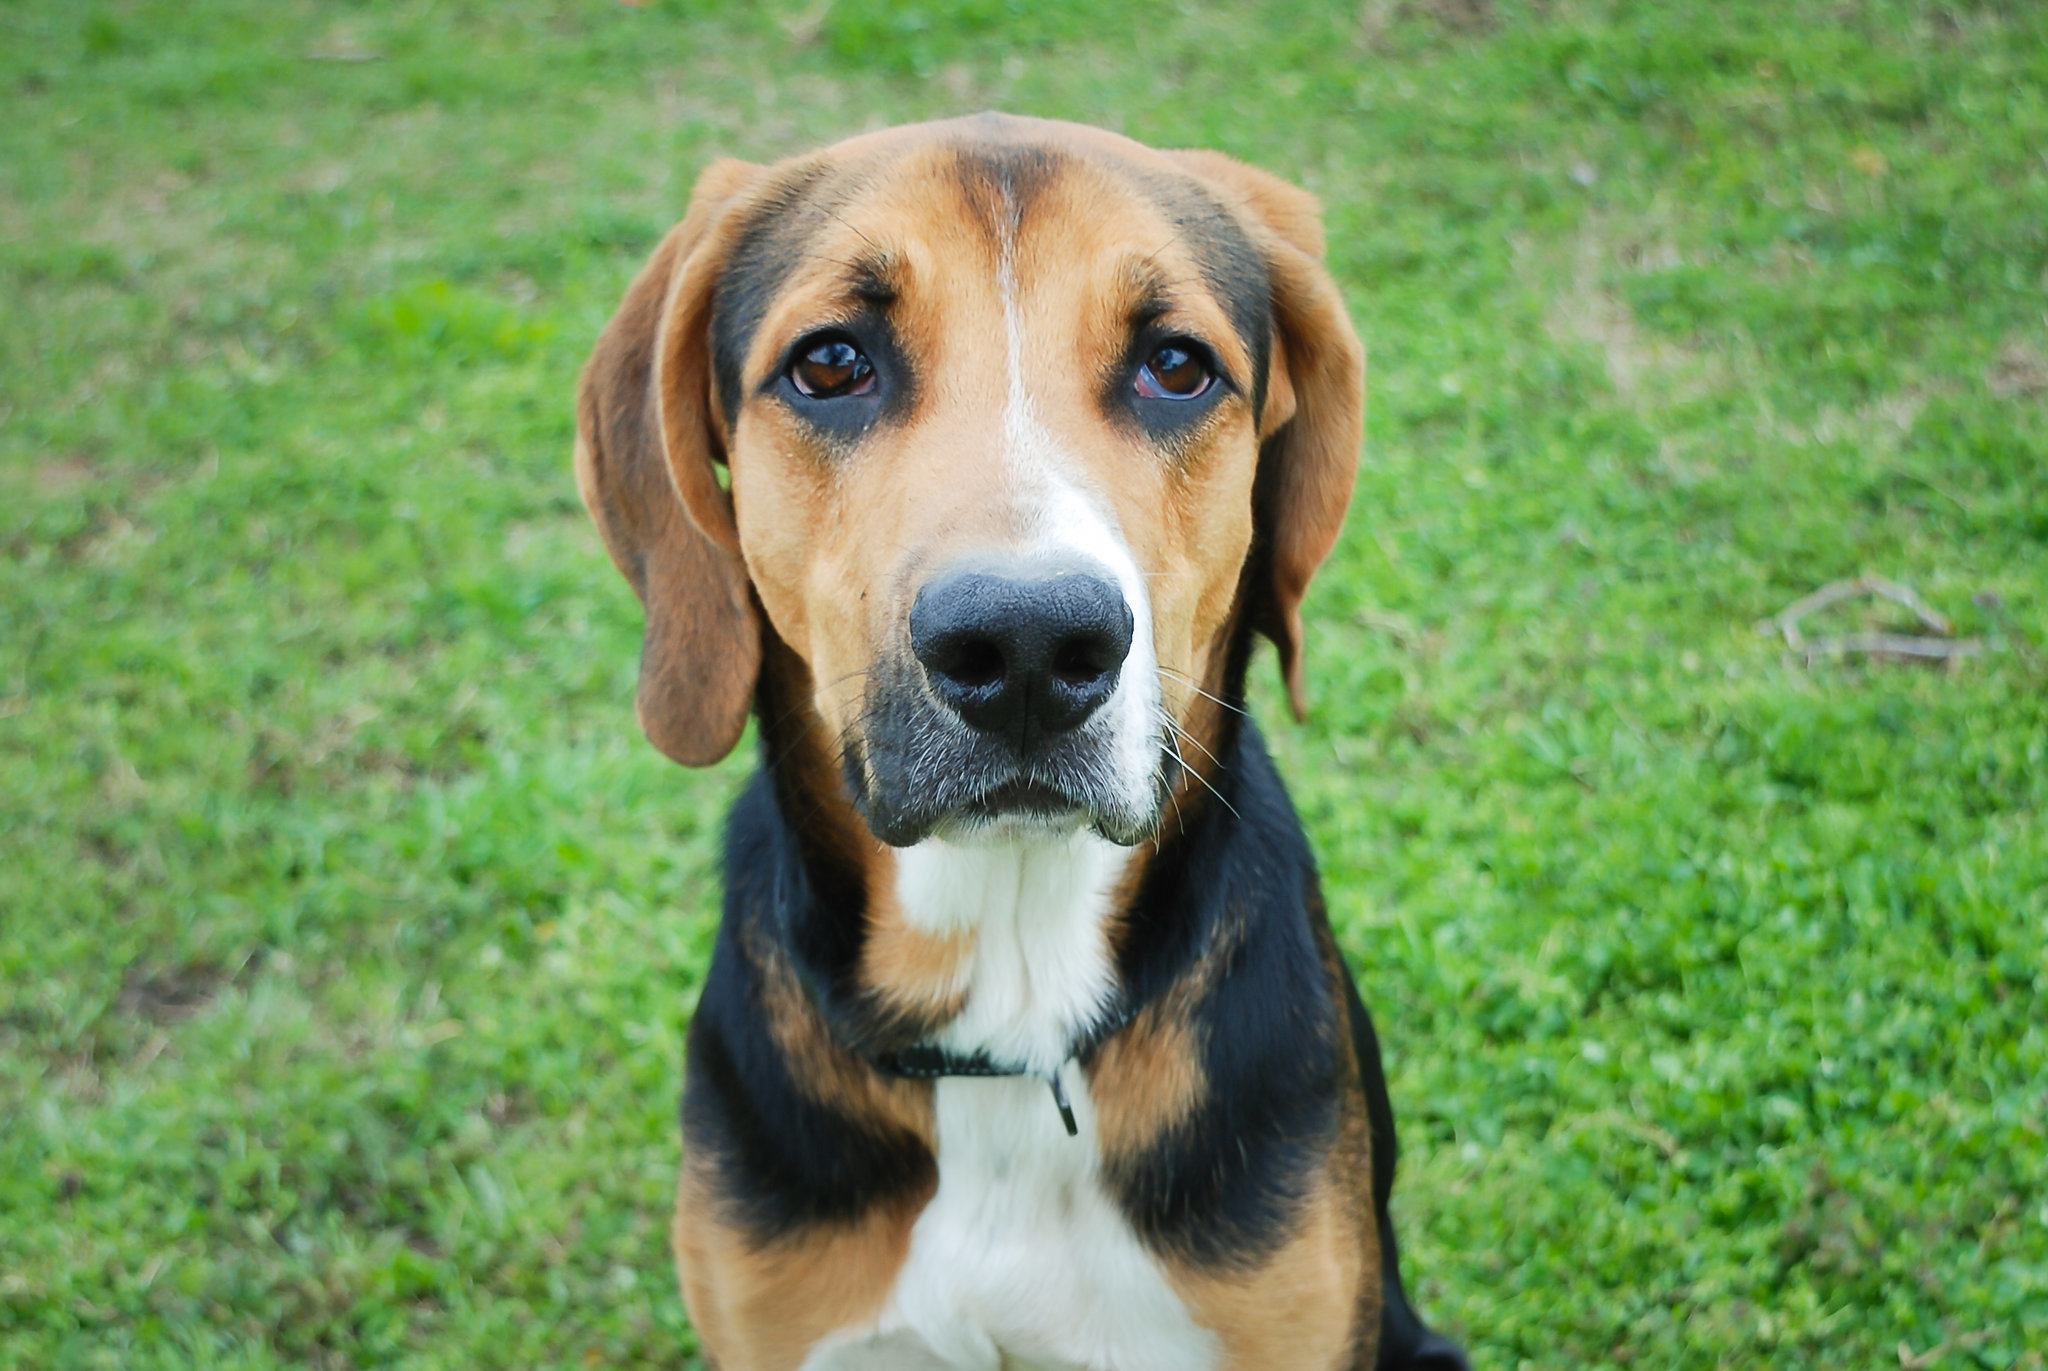 Petey with Puppy Dog Eyes